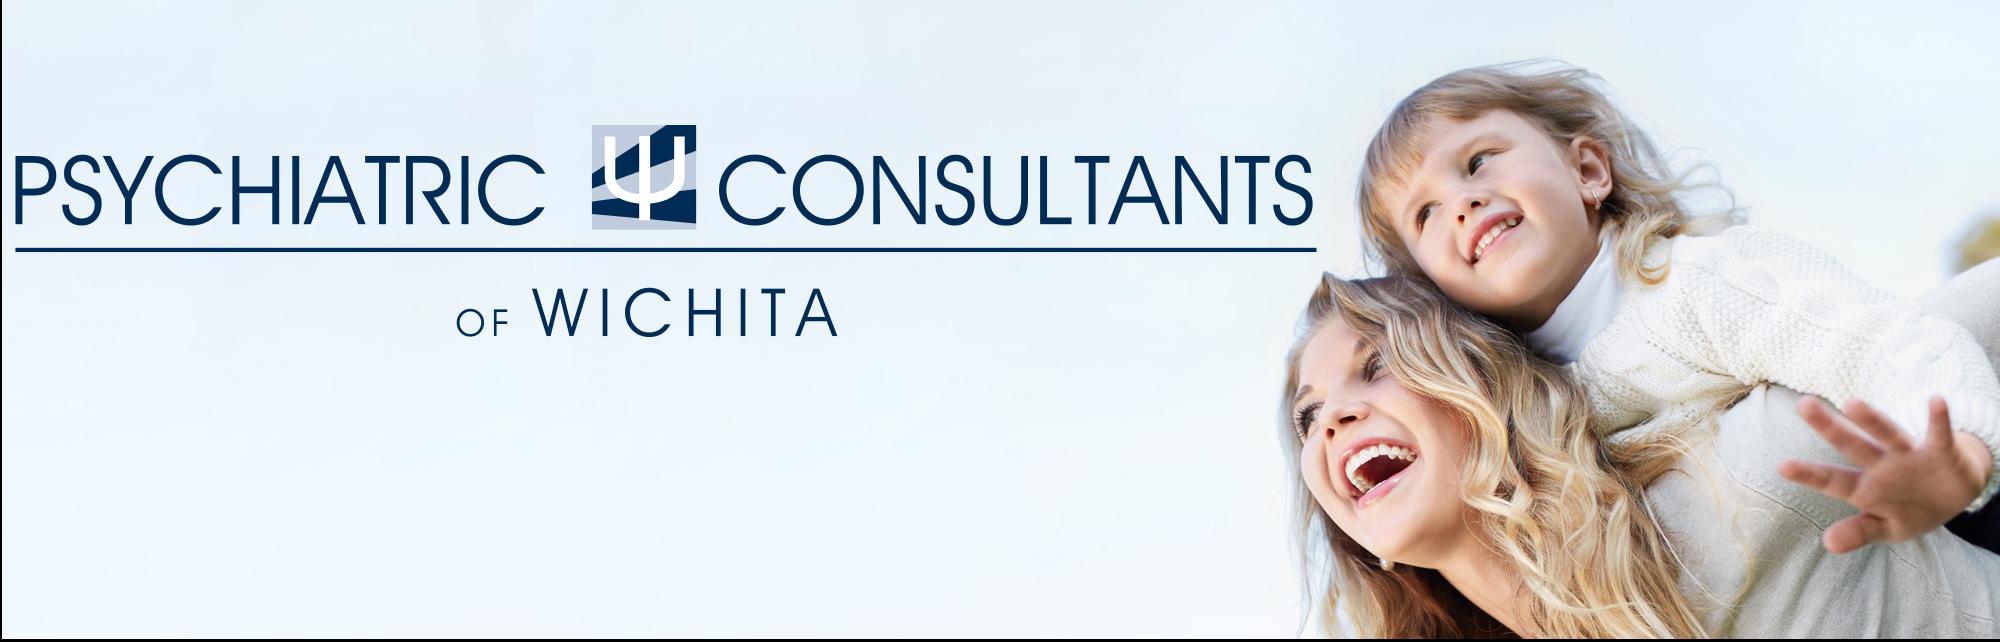 Psychiatric Consultants of Wichita